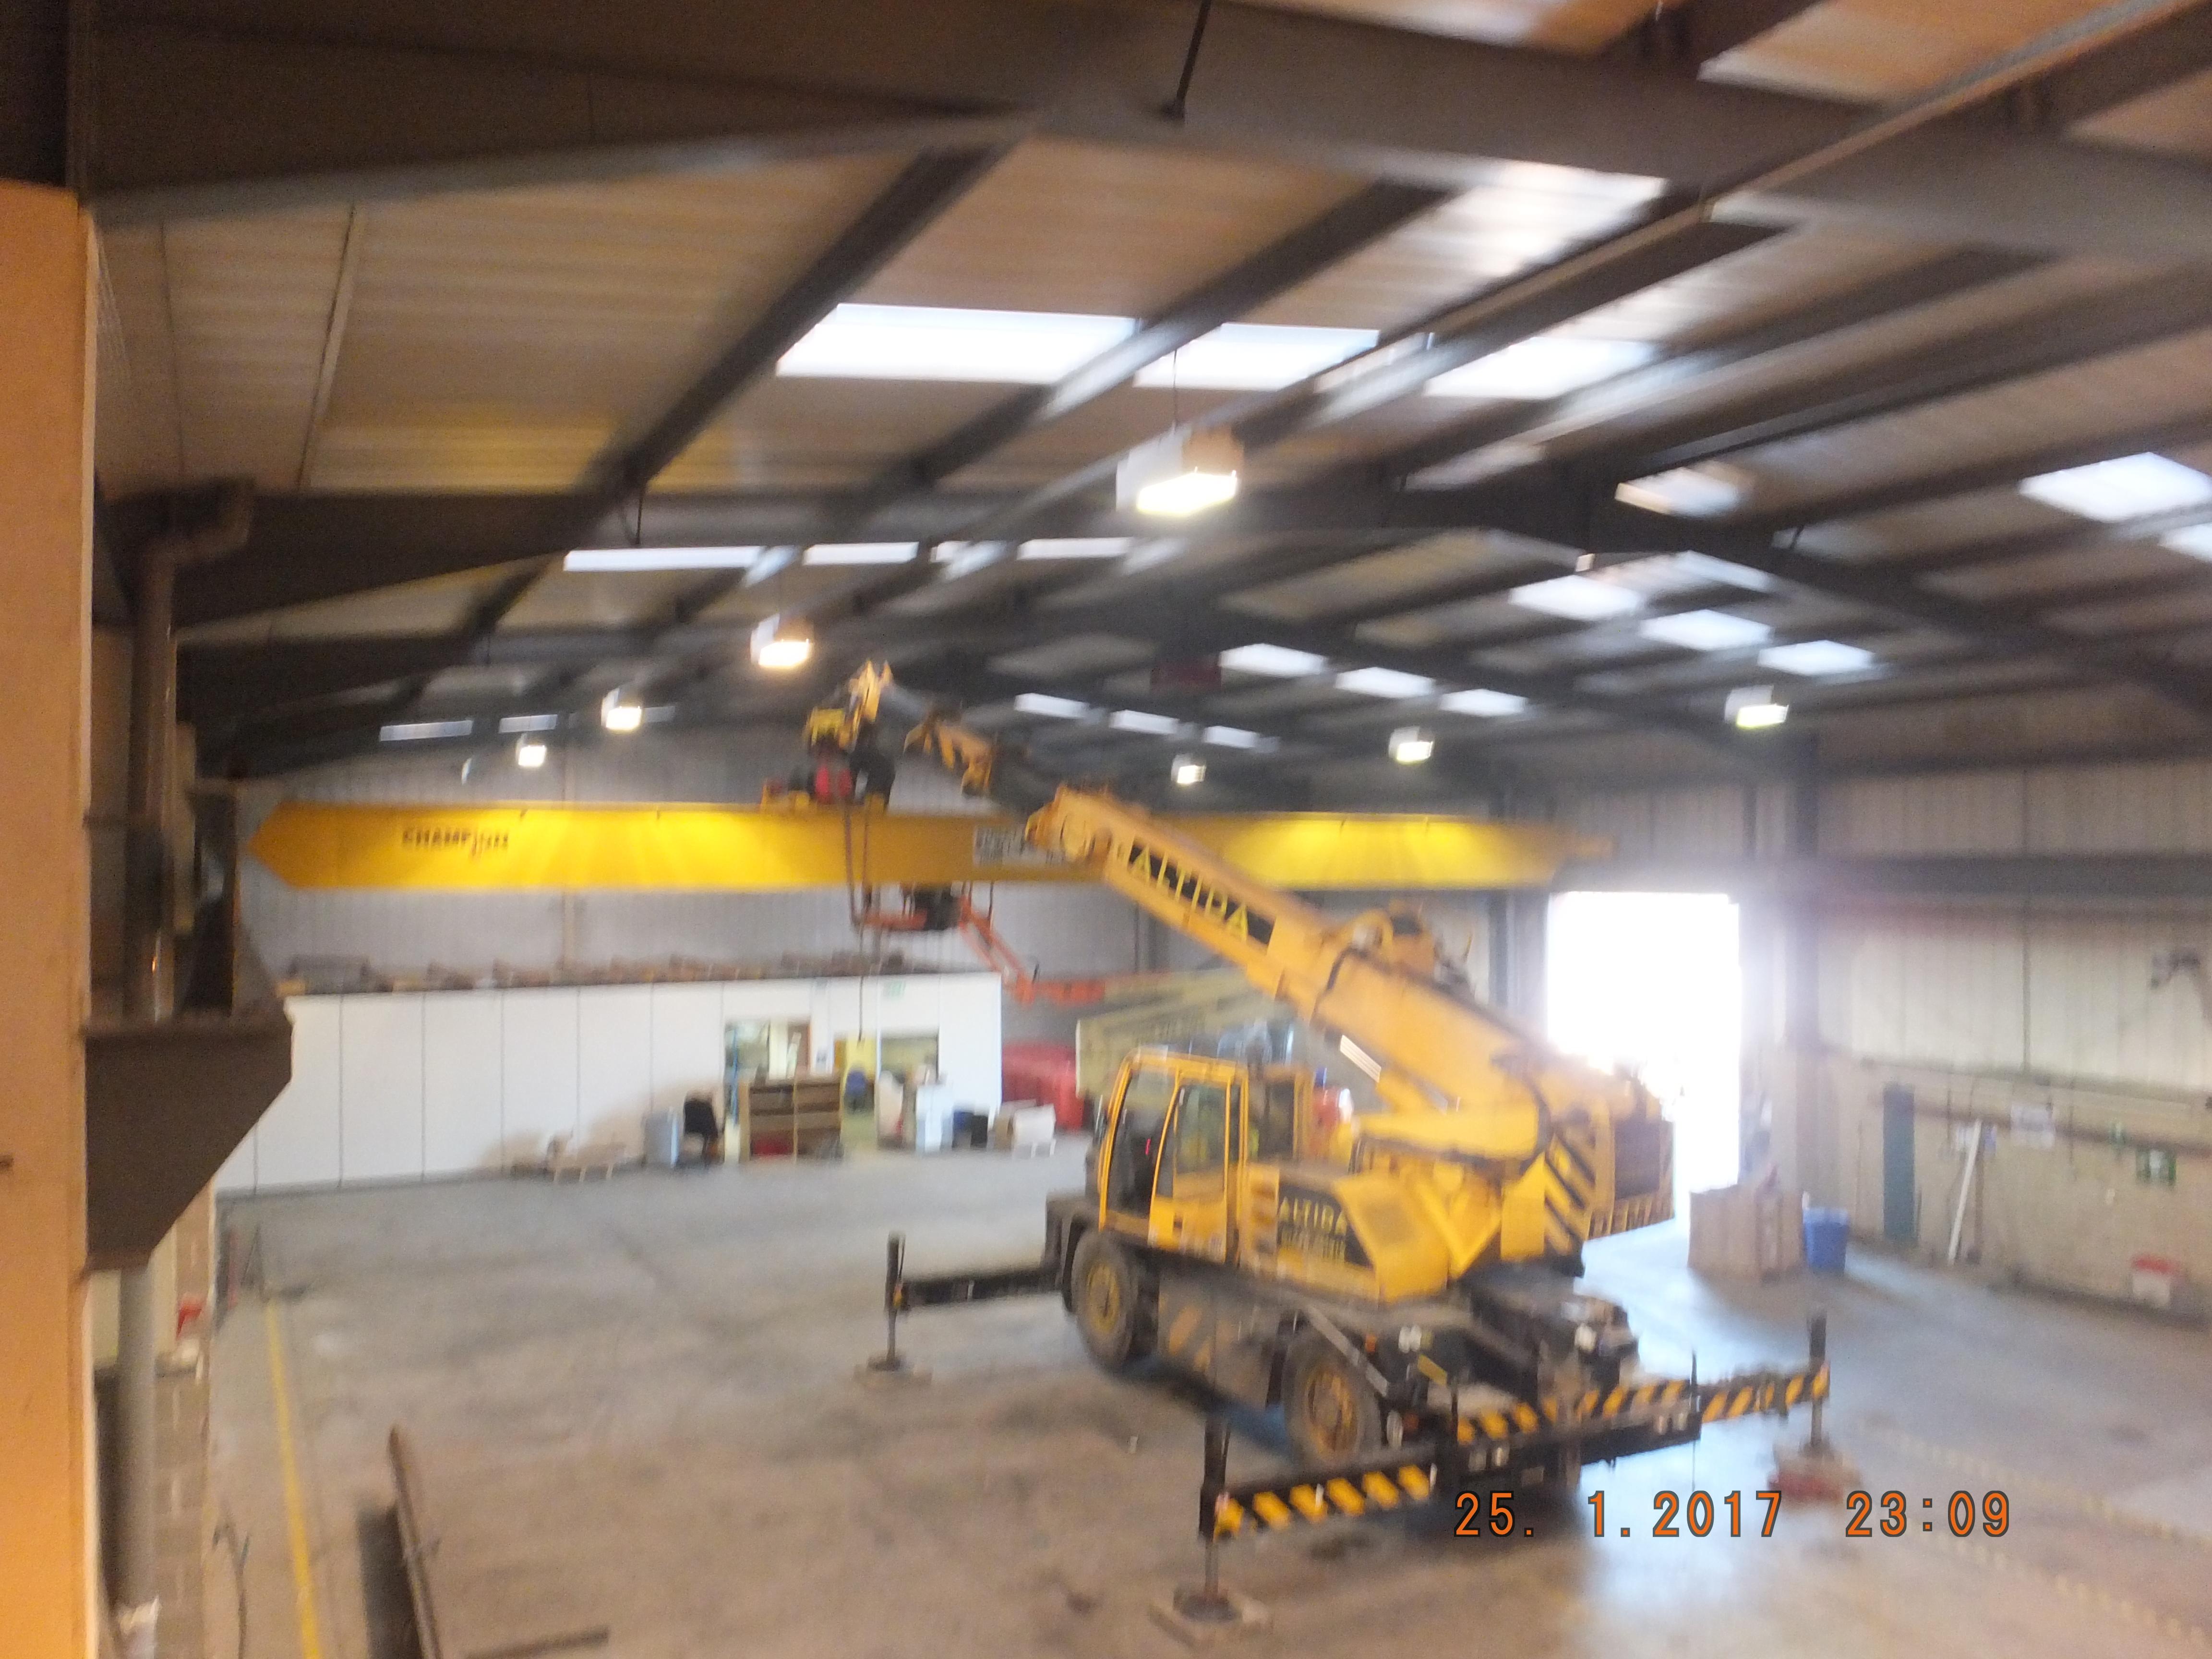 Overhead Crane Parts Uk : Hanlon wright ? ton overhead crane removal